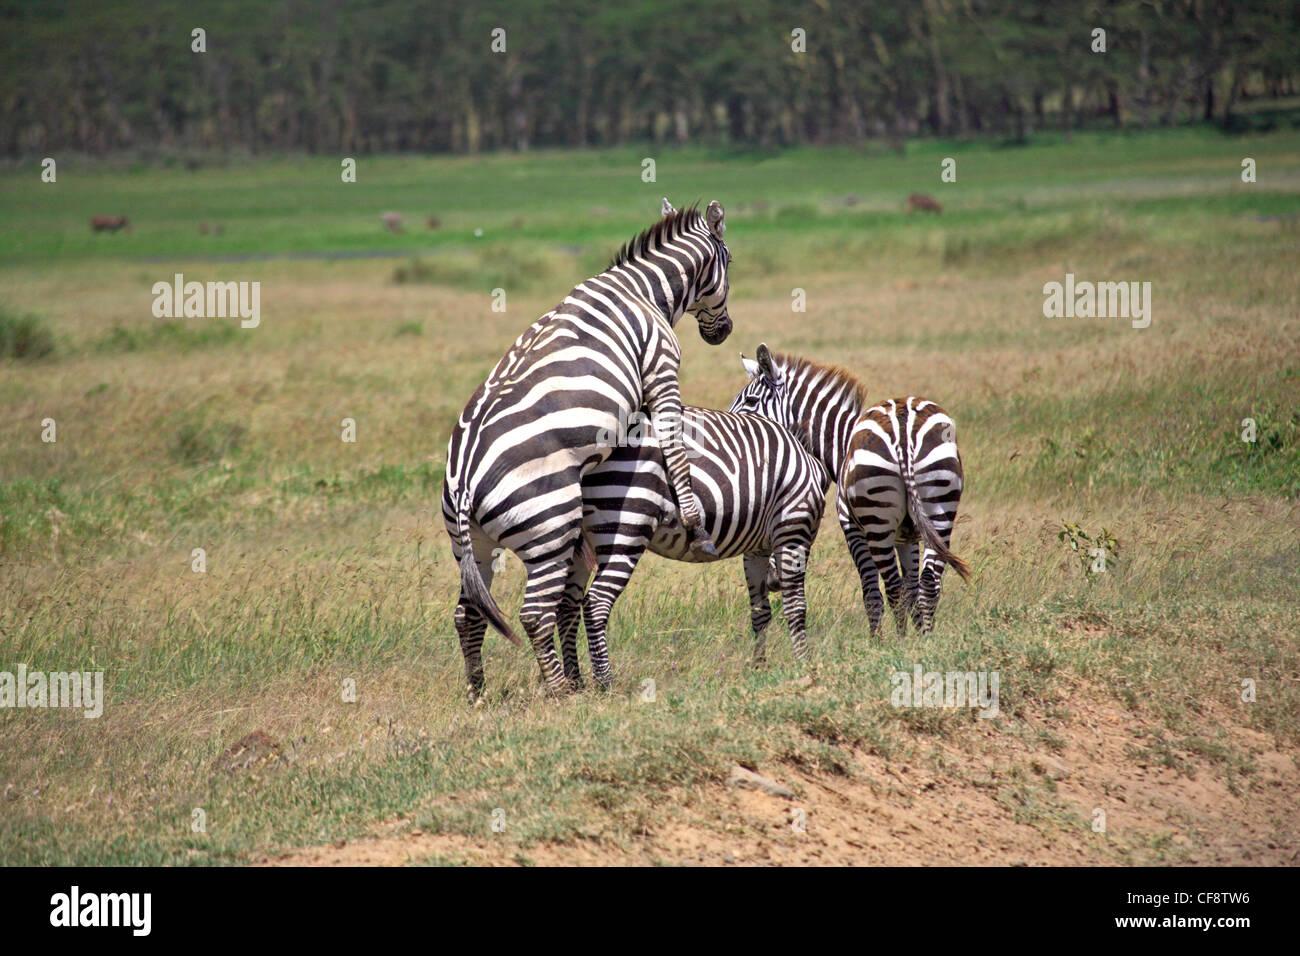 Zebras mating - photo#54